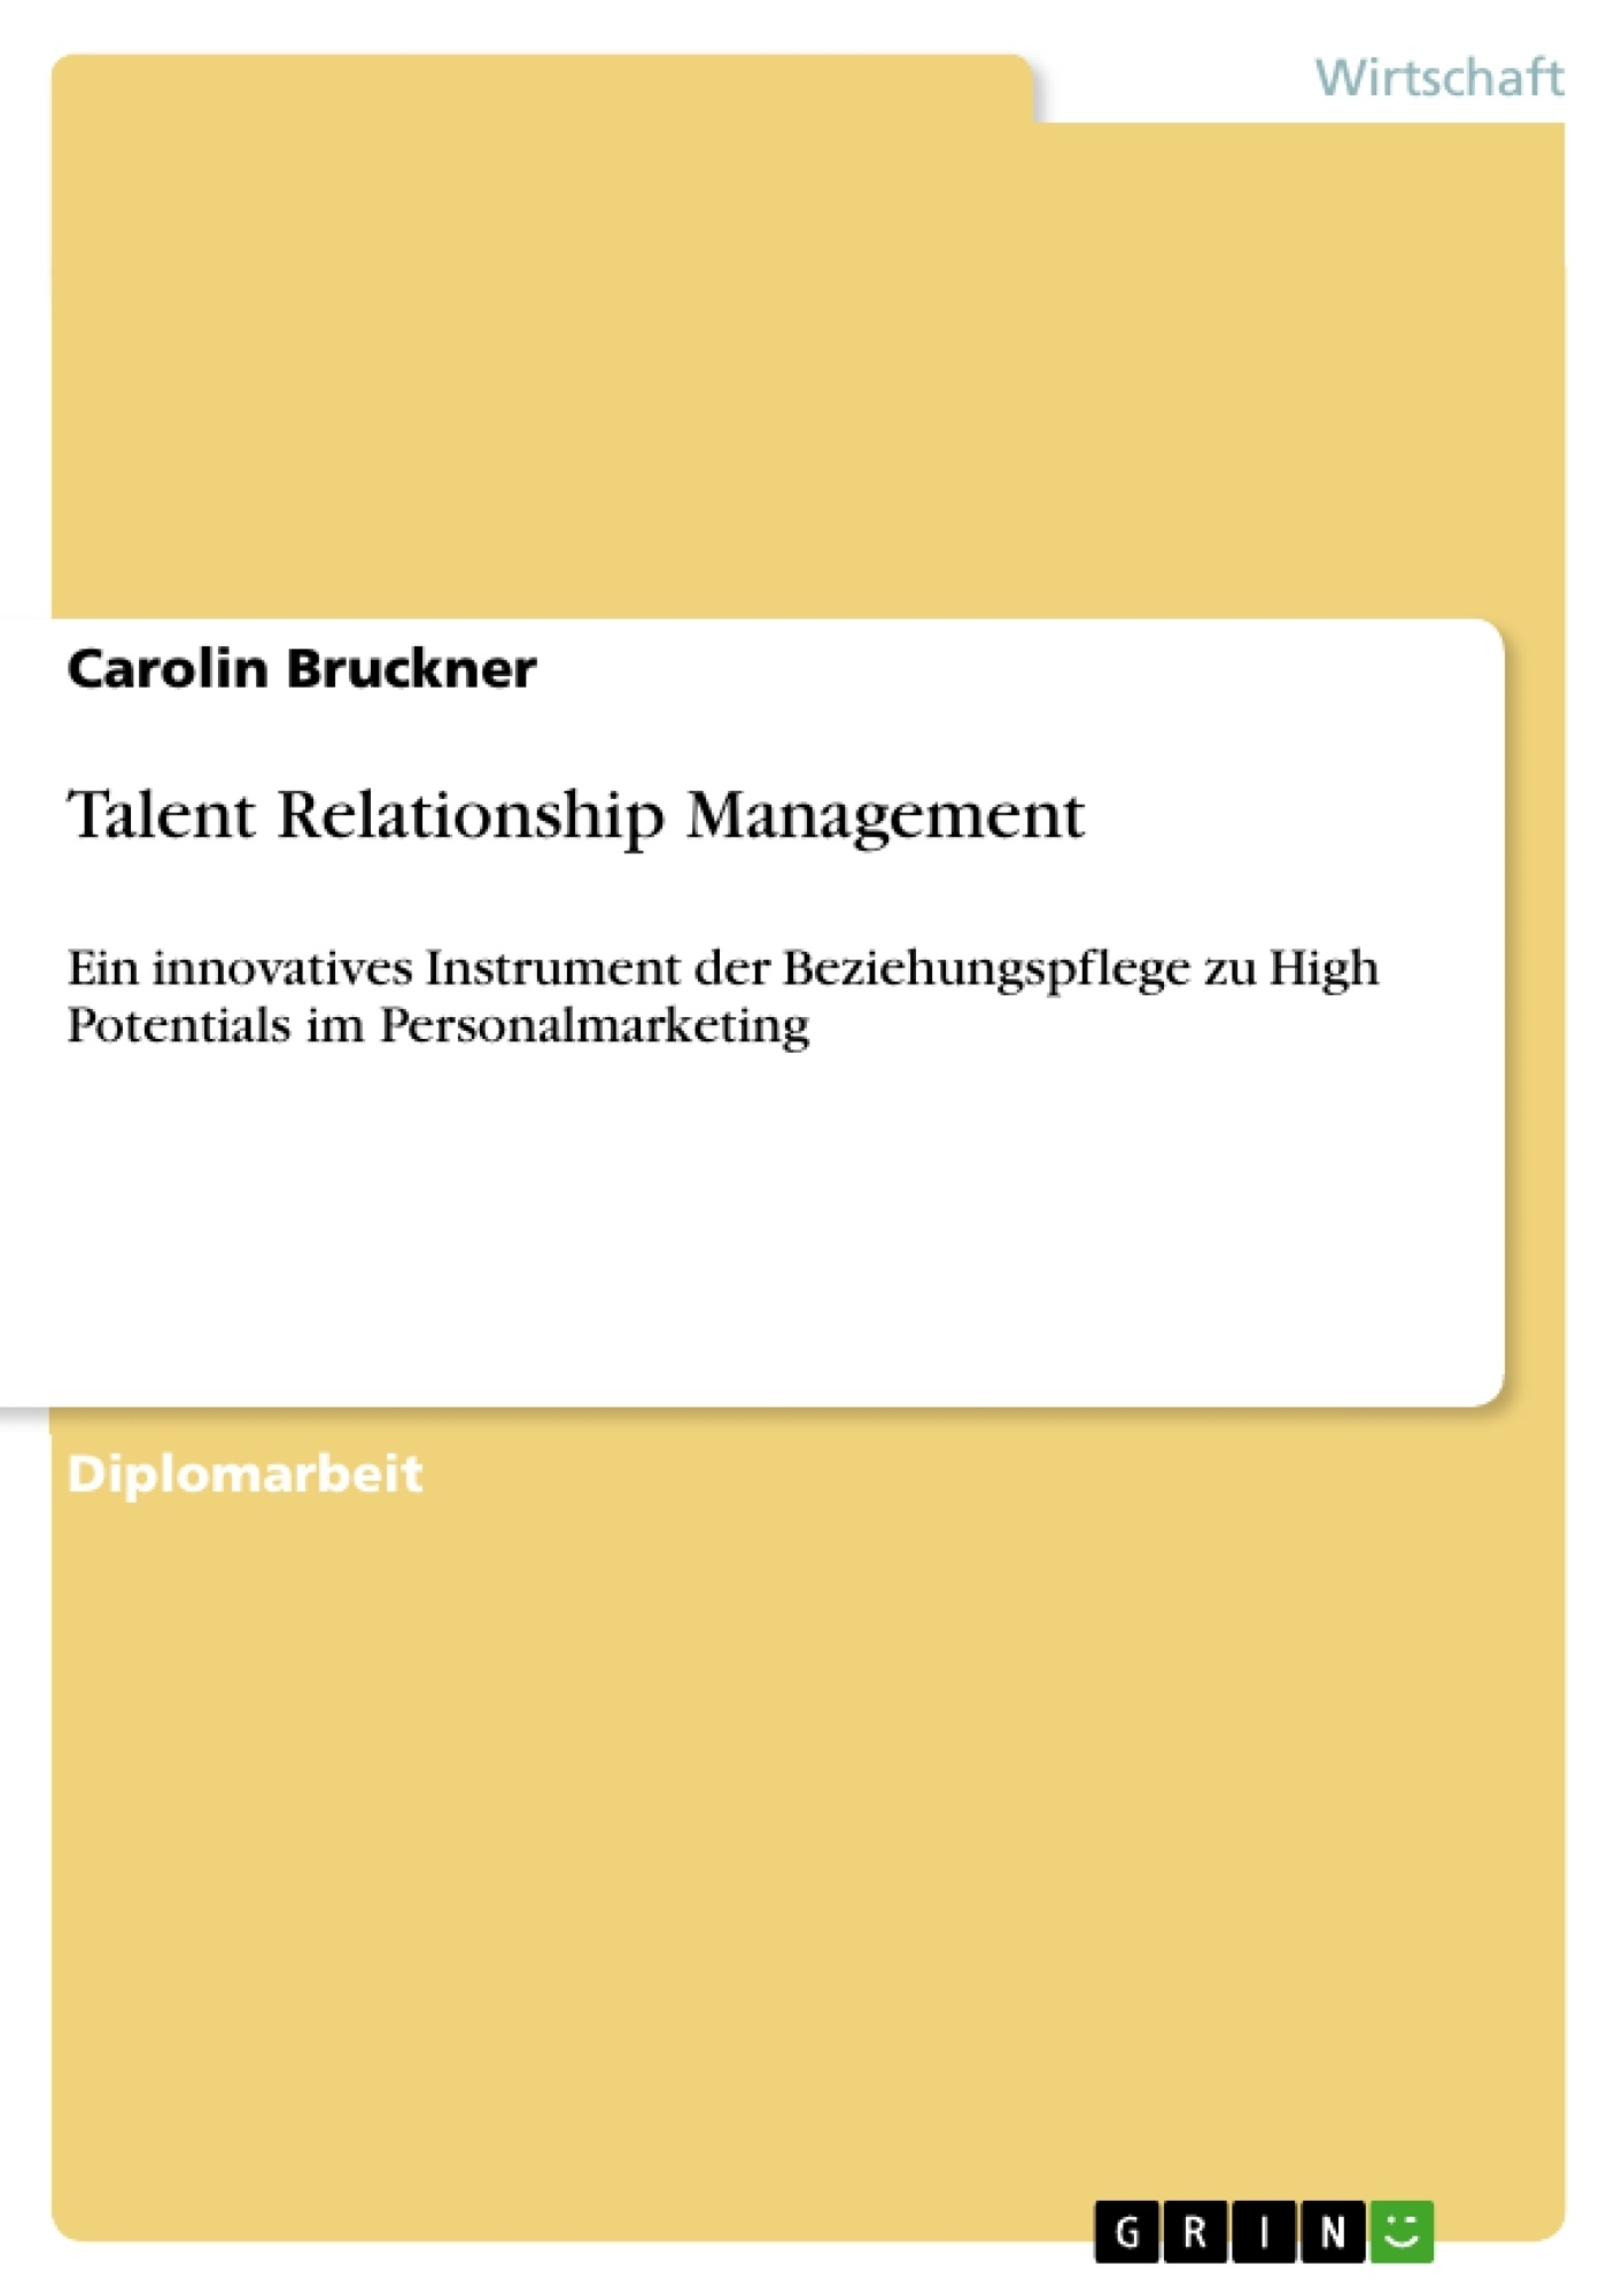 Titel: Talent Relationship Management